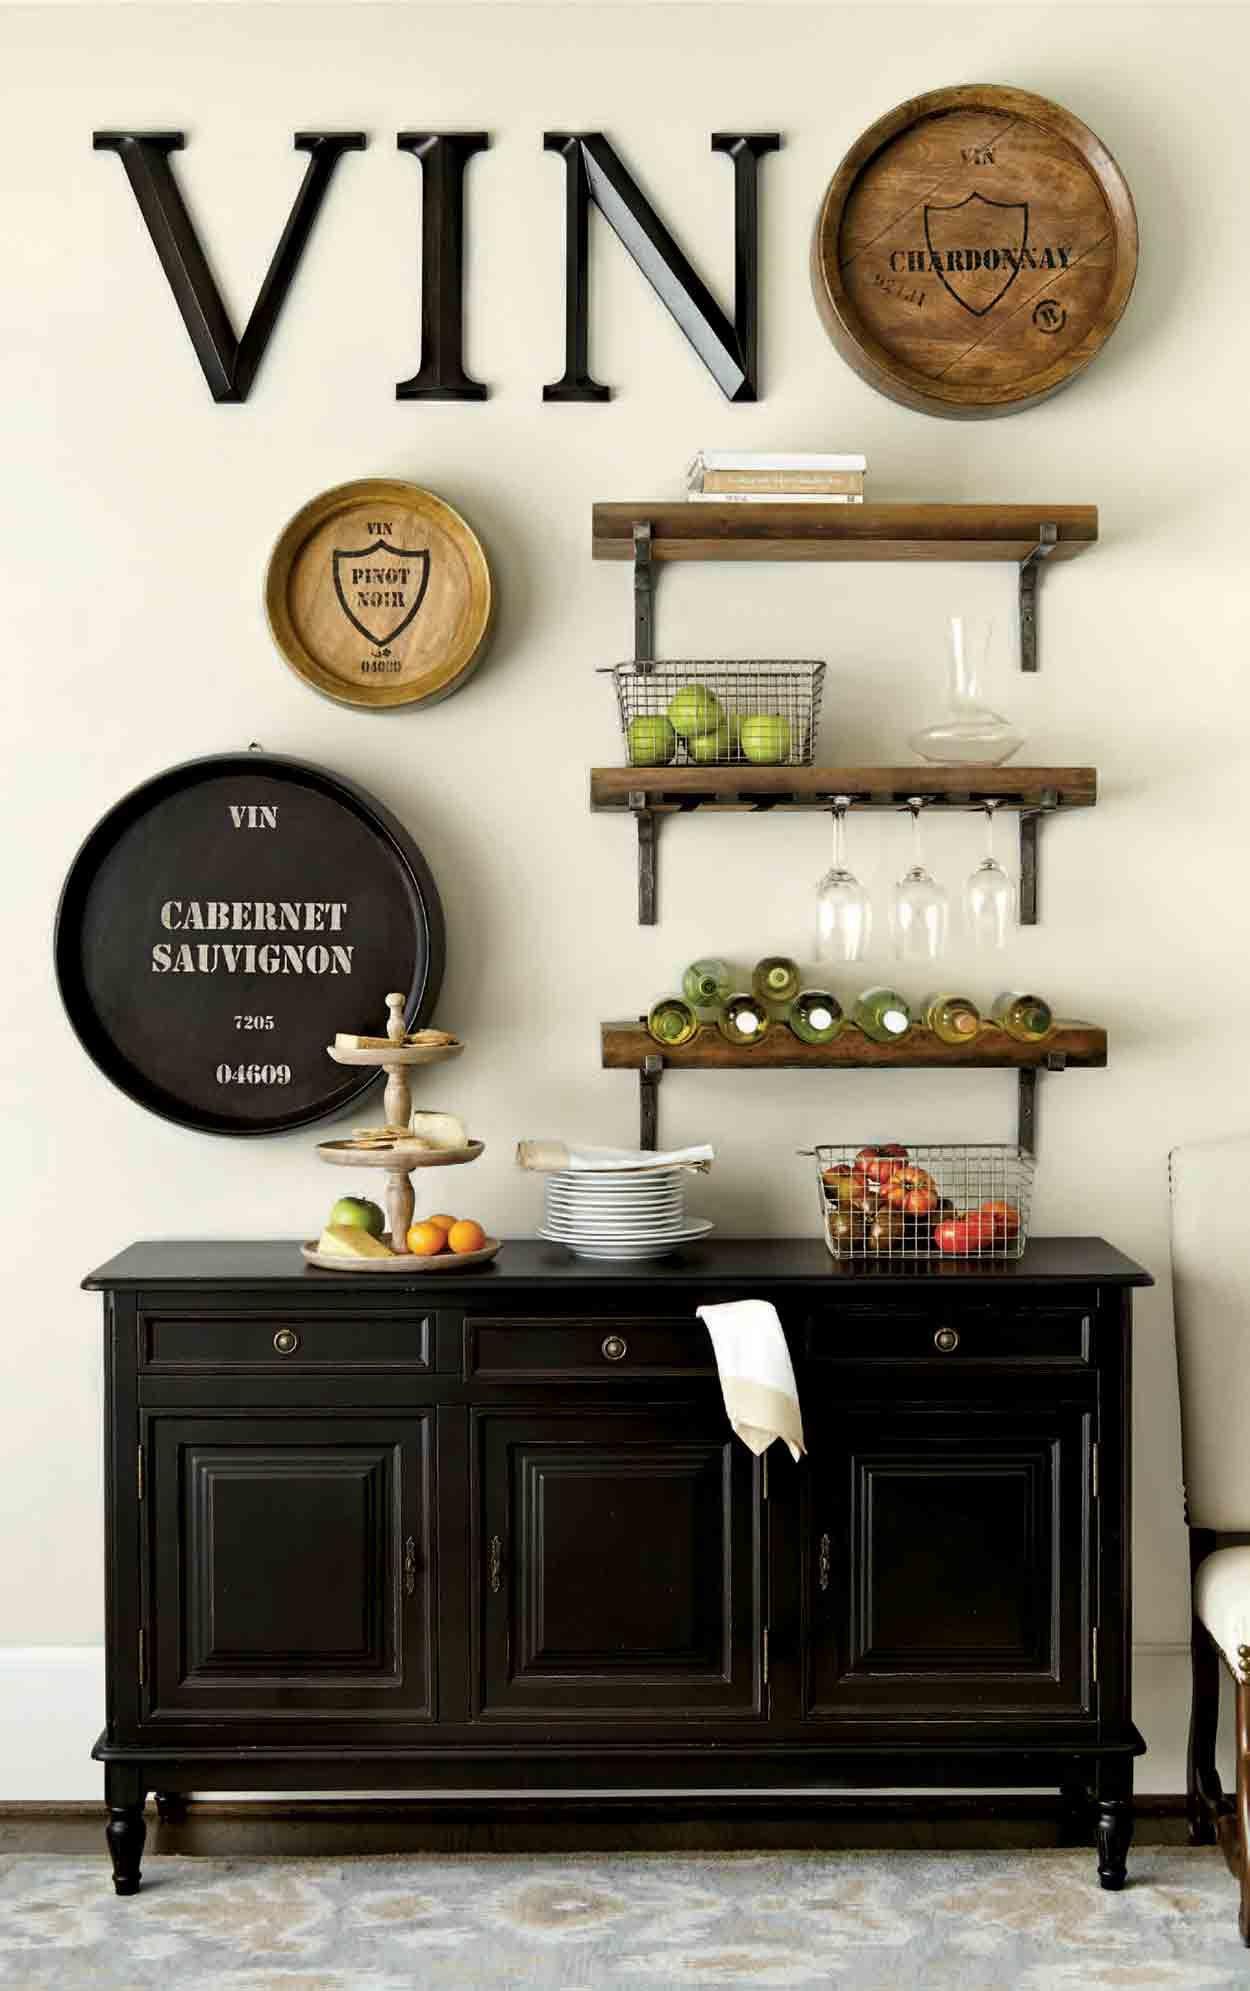 Dining Room Decorating Ideas Kitchen Decor Dining Room Walls